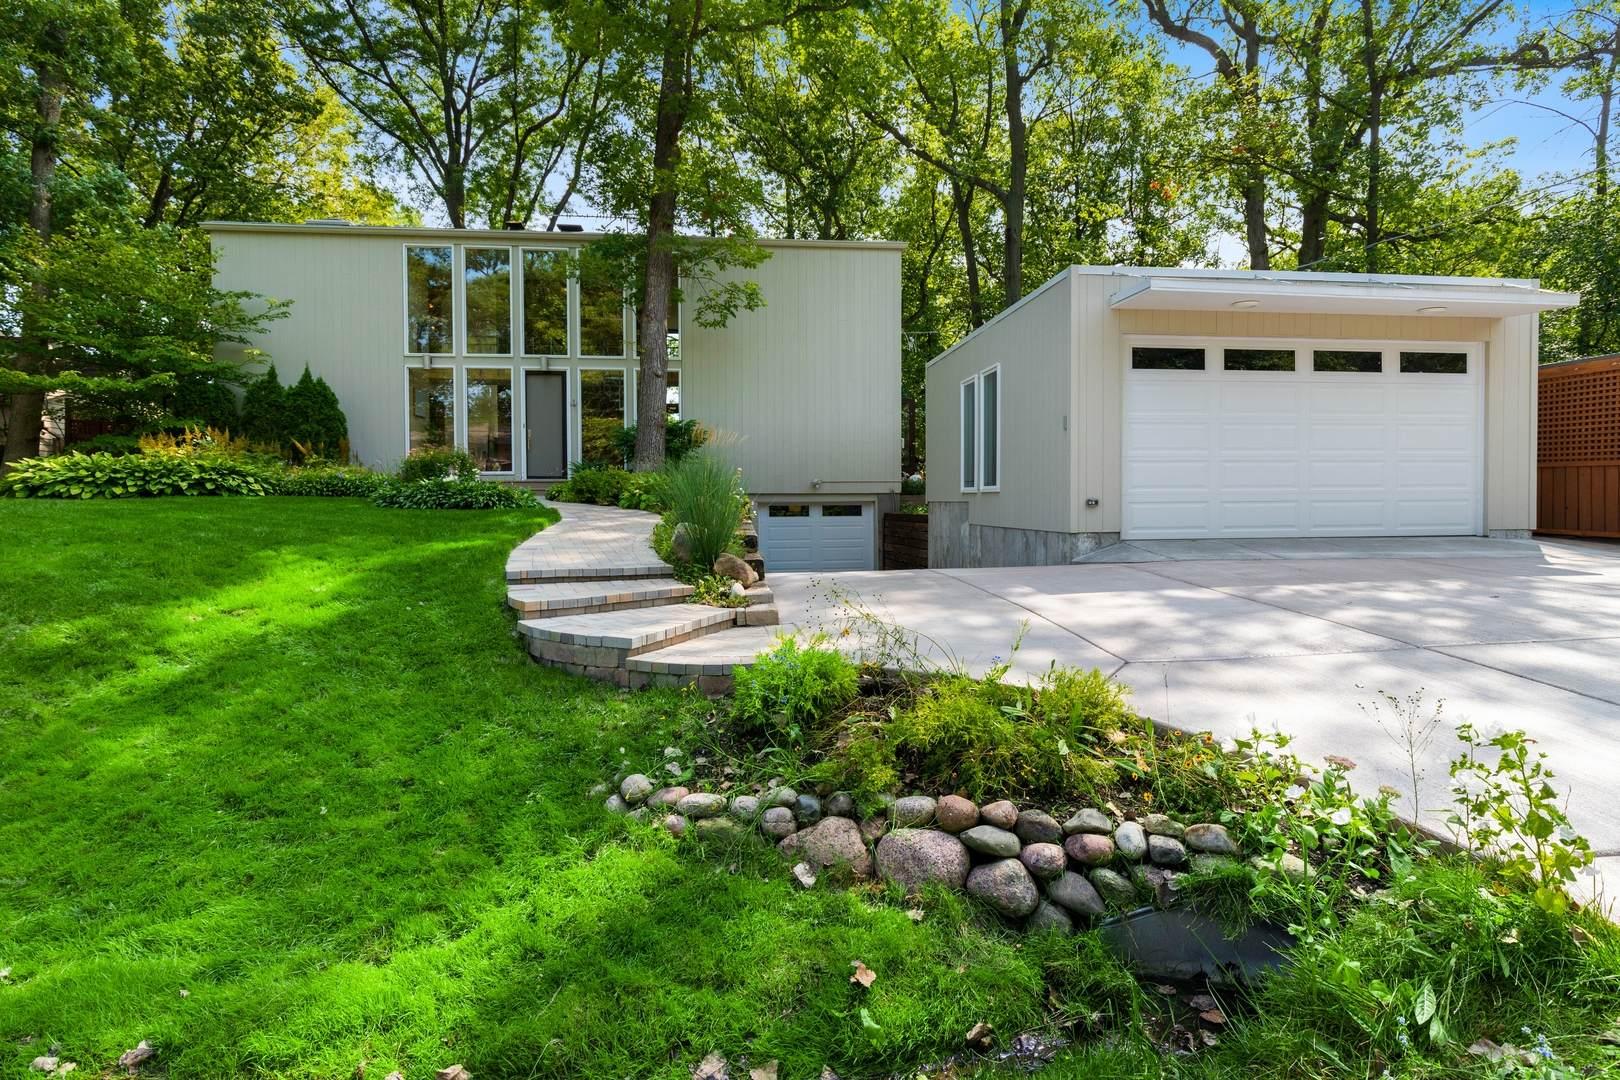 227 Rivers Drive, Lake Bluff, IL 60044 (MLS #10878140) :: Lewke Partners